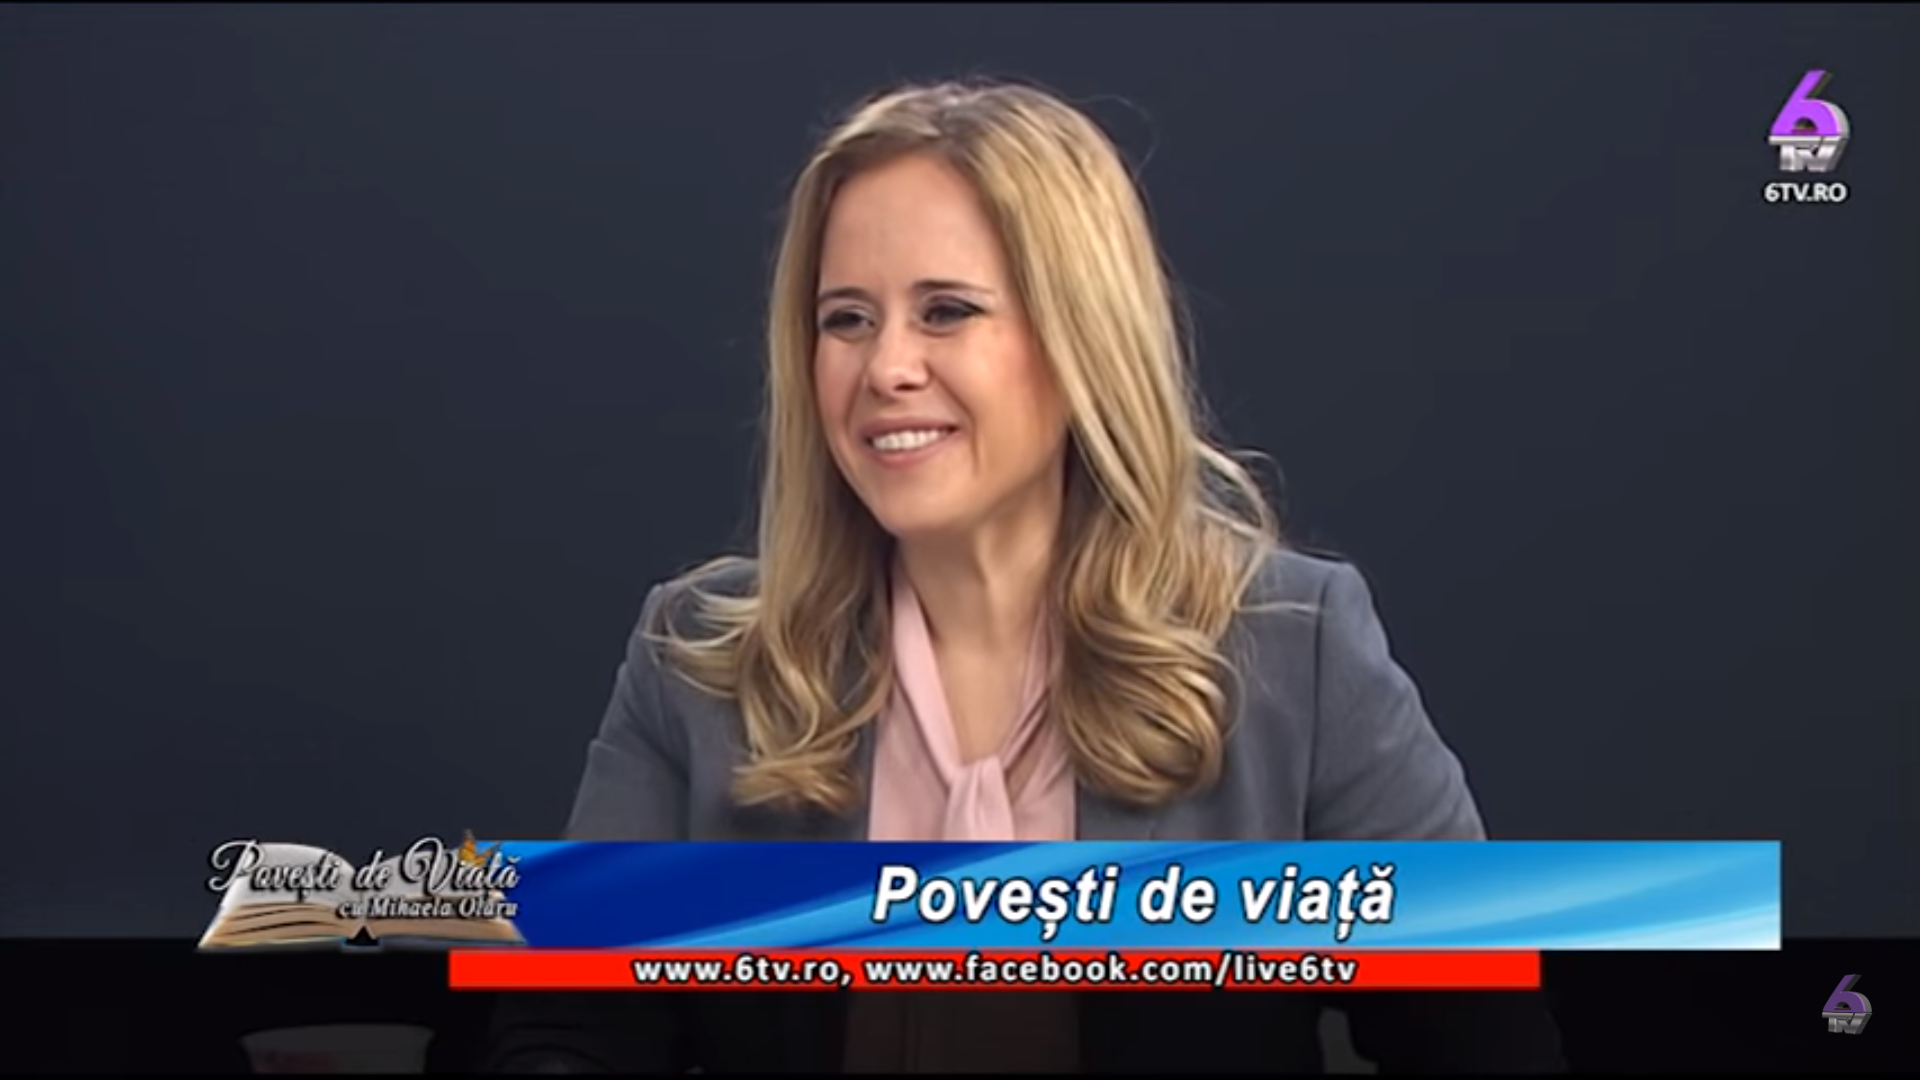 4. Doctor Mihaela Bilic